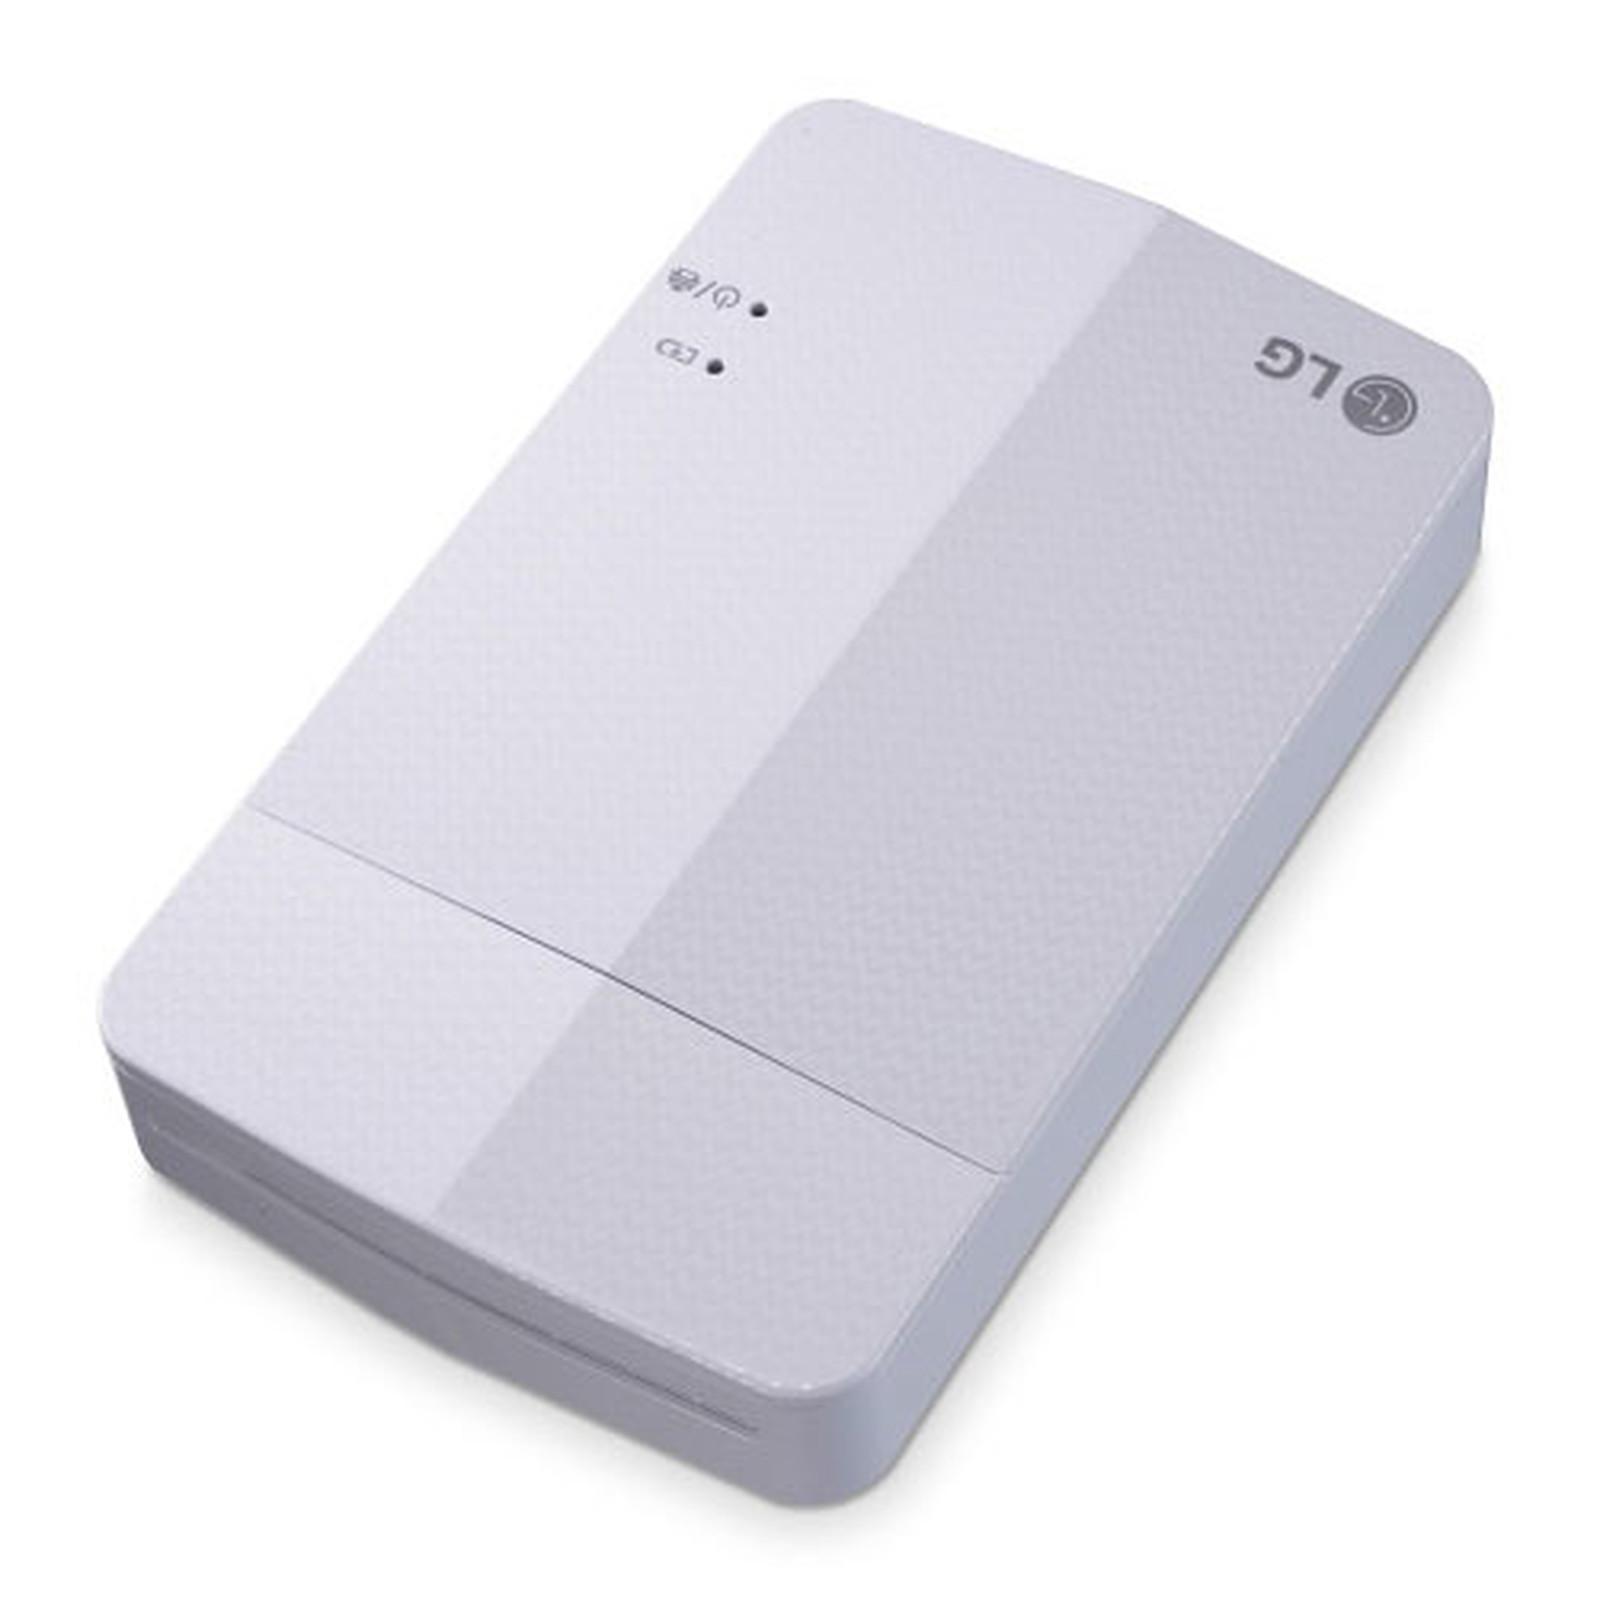 LG PD251 Blanc